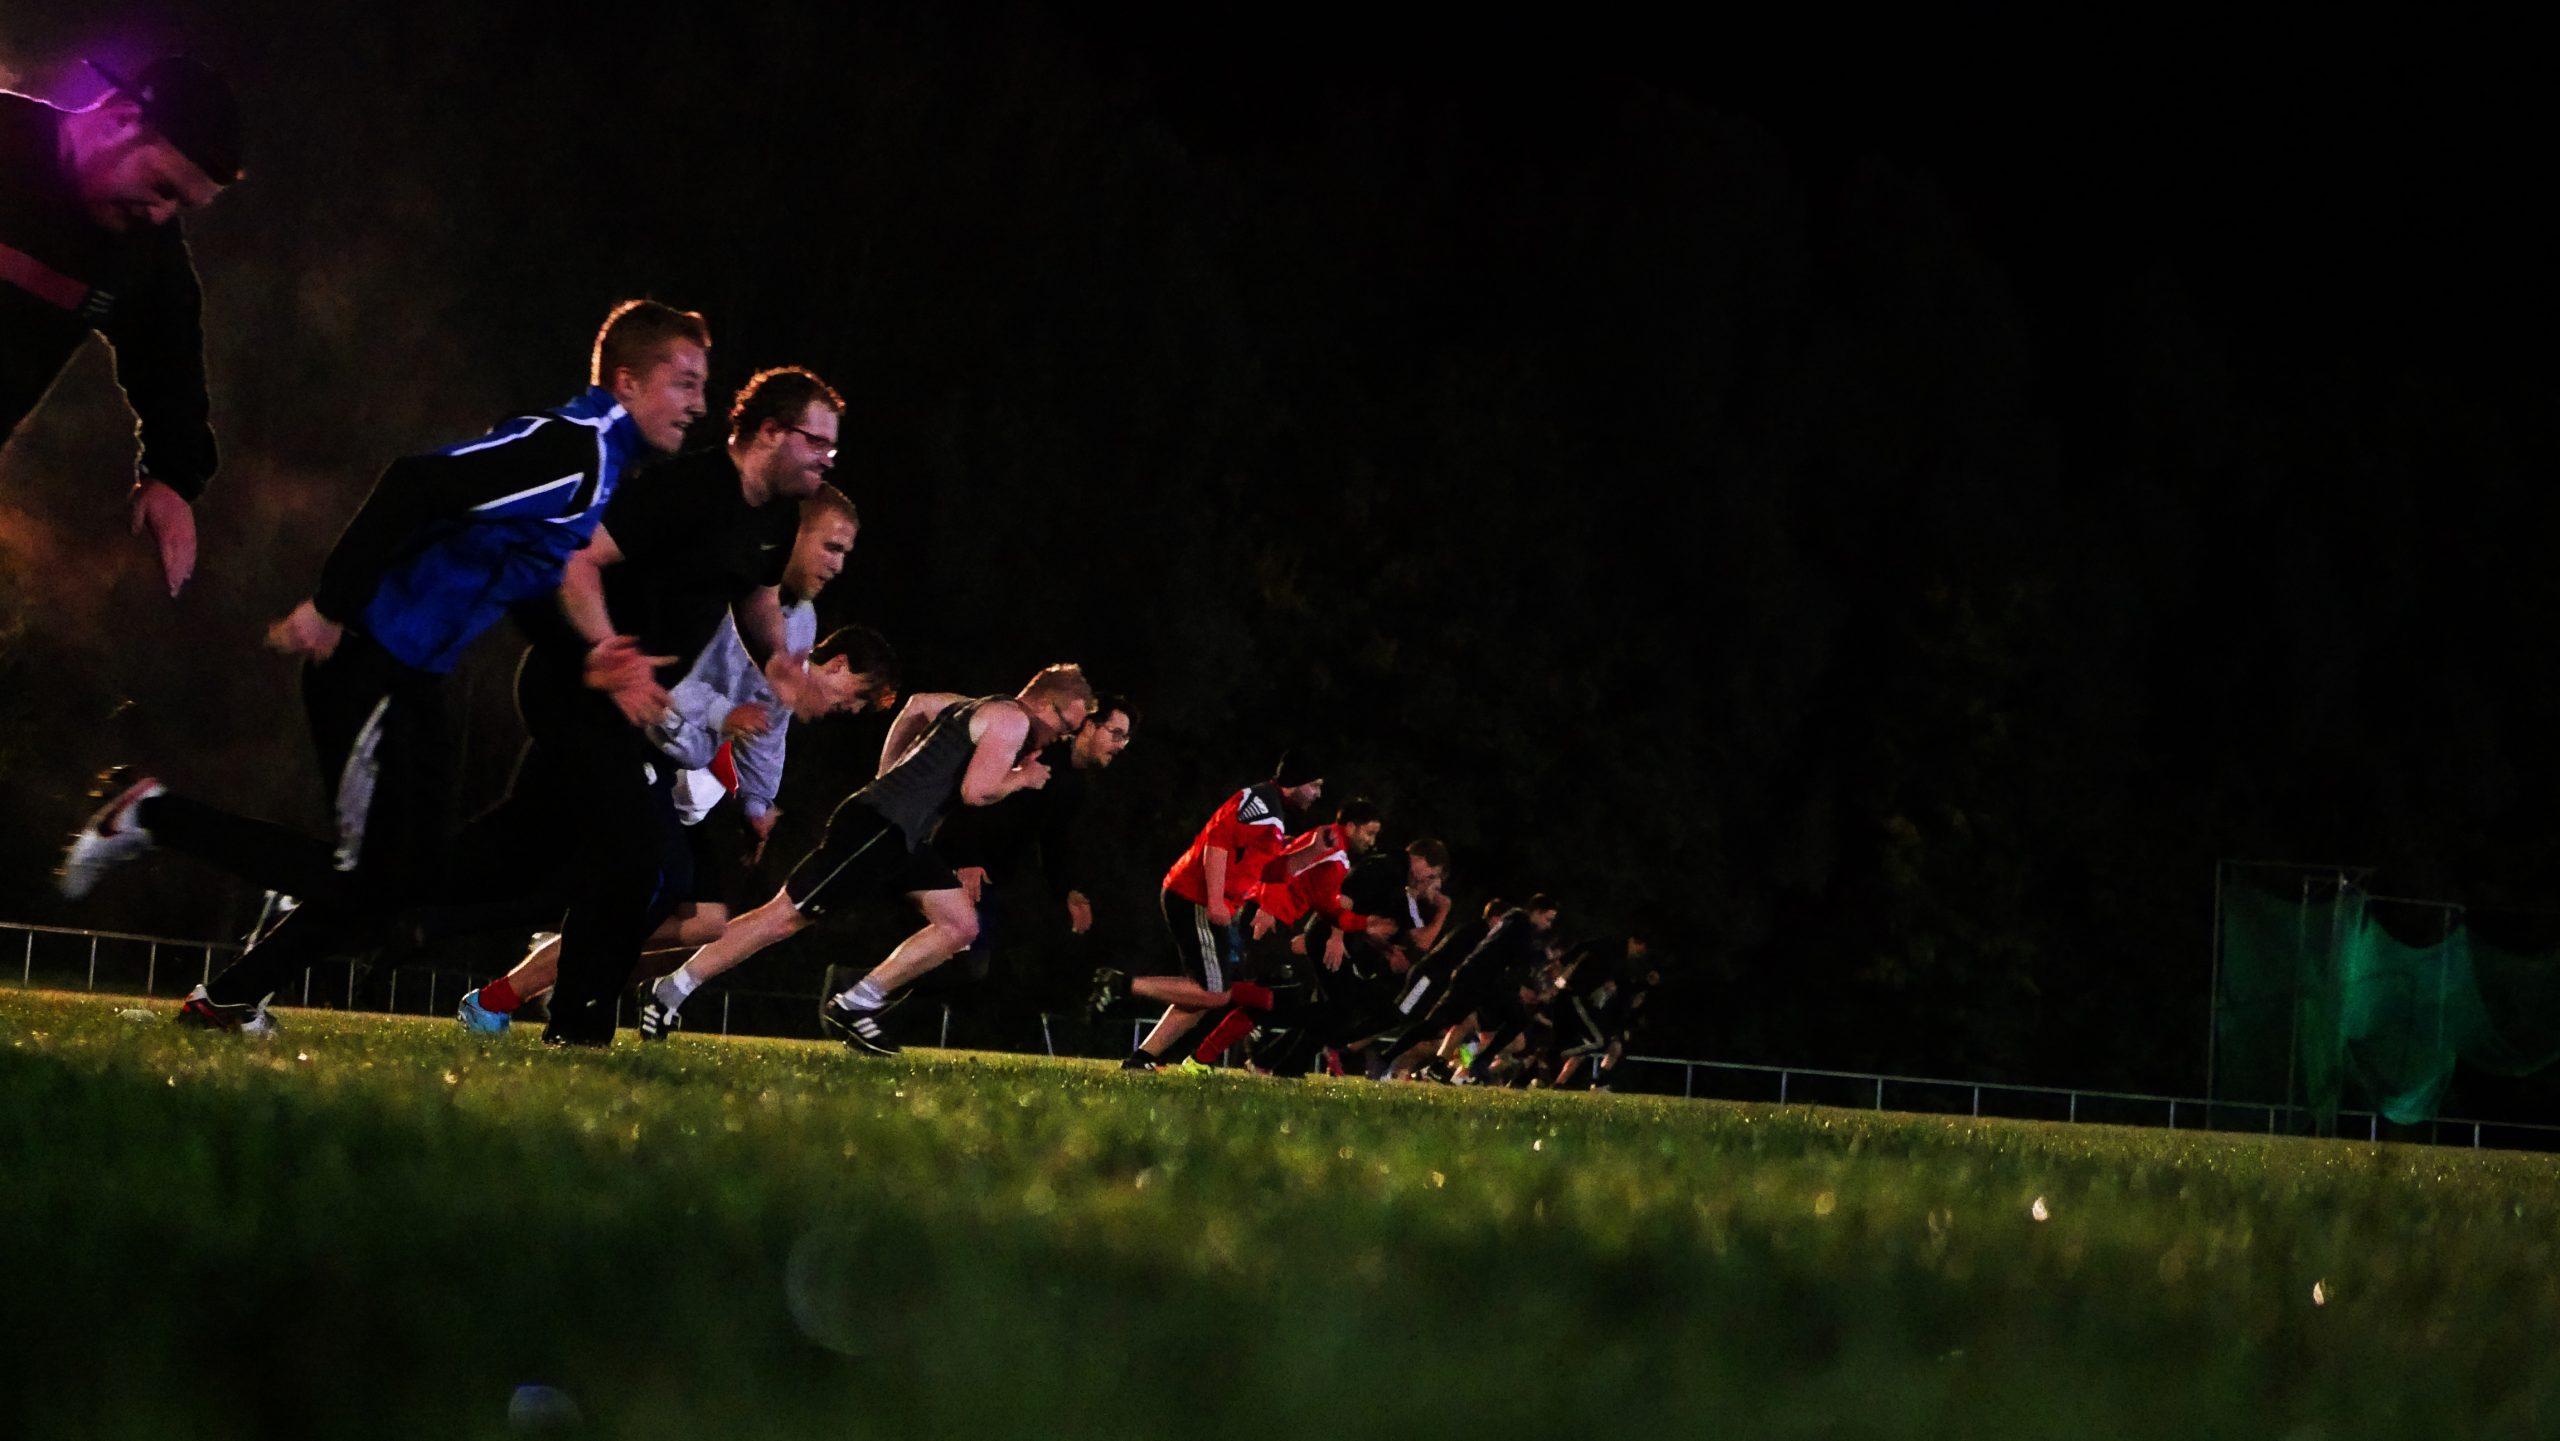 Konstanz Pirates - American Football - run2